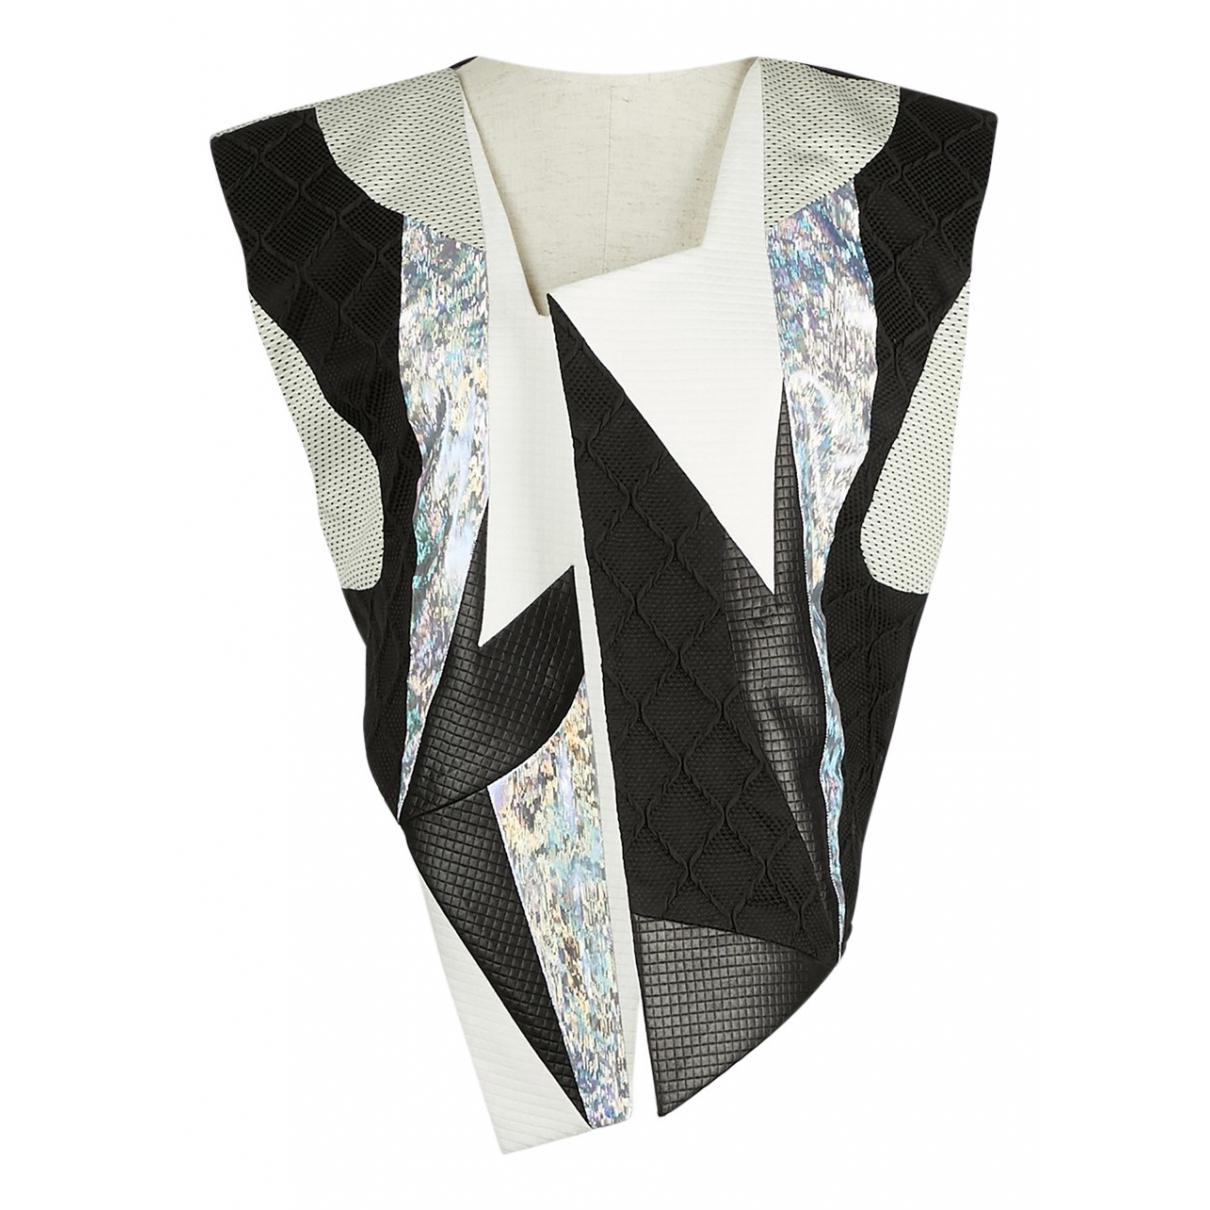 Kaal E.suktae \N Multicolour jacket for Women 38 FR